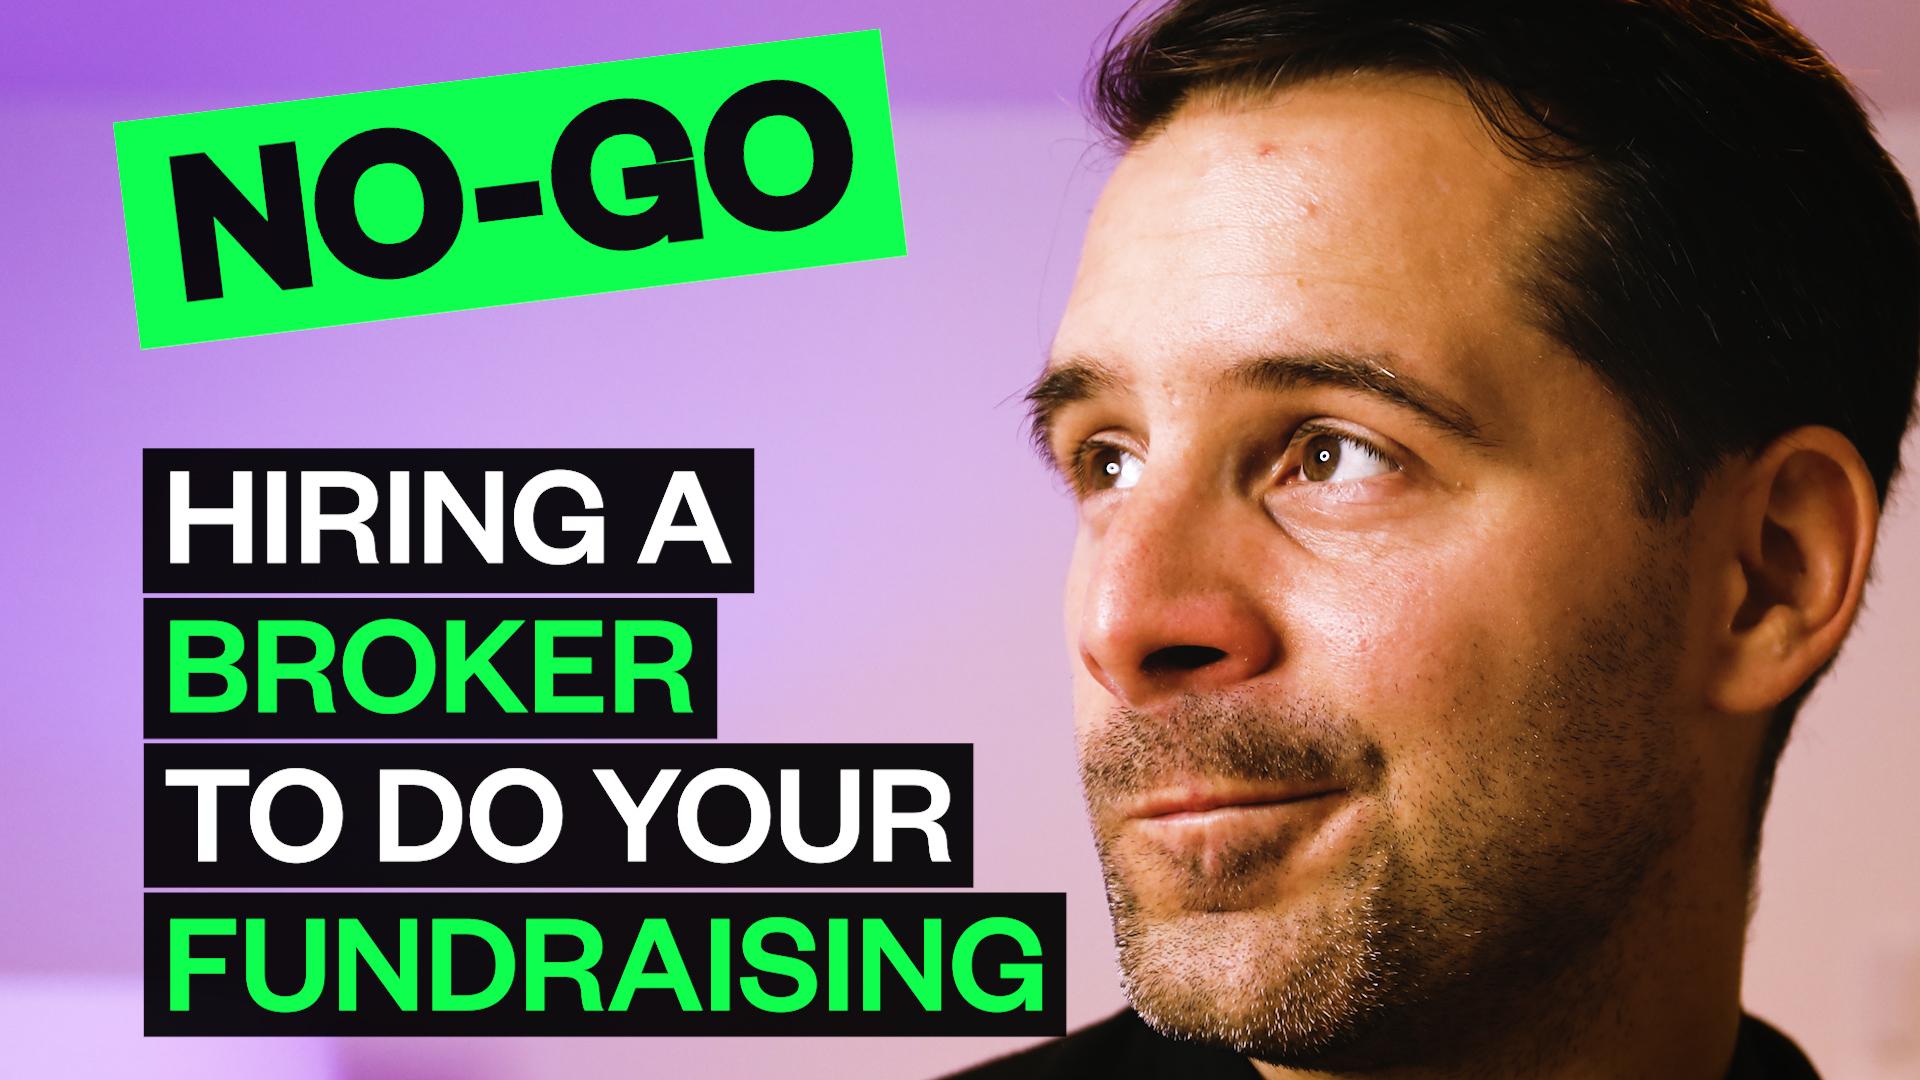 NO-GO: Hiring A Broker to Do Your Fundraising